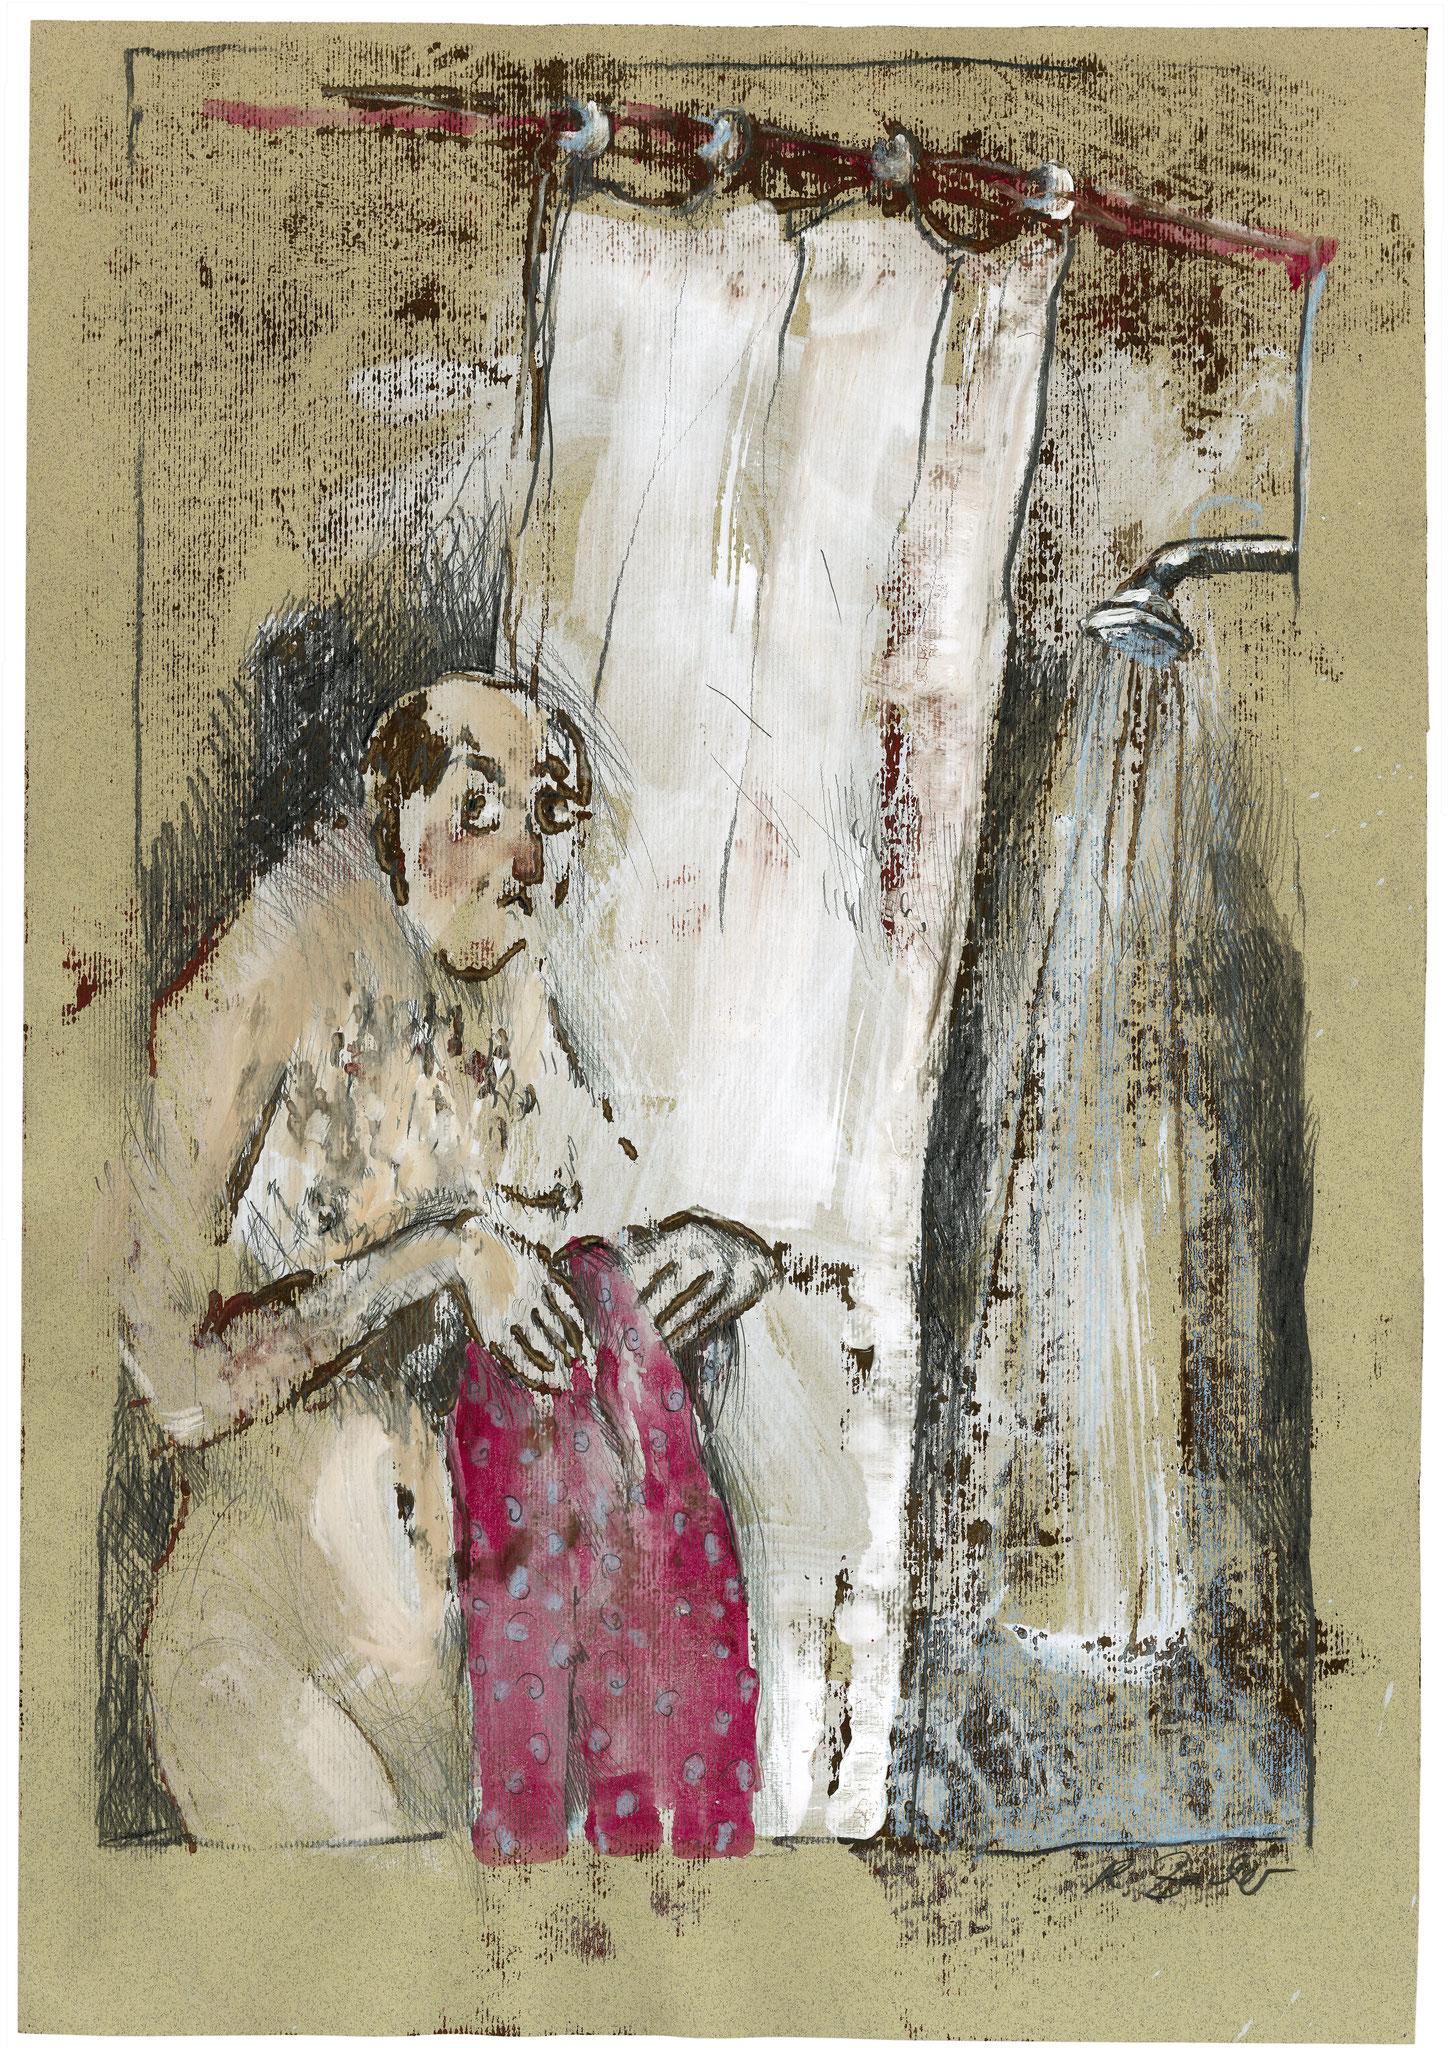 Betreten, Monotypie, 70 x 50 cm